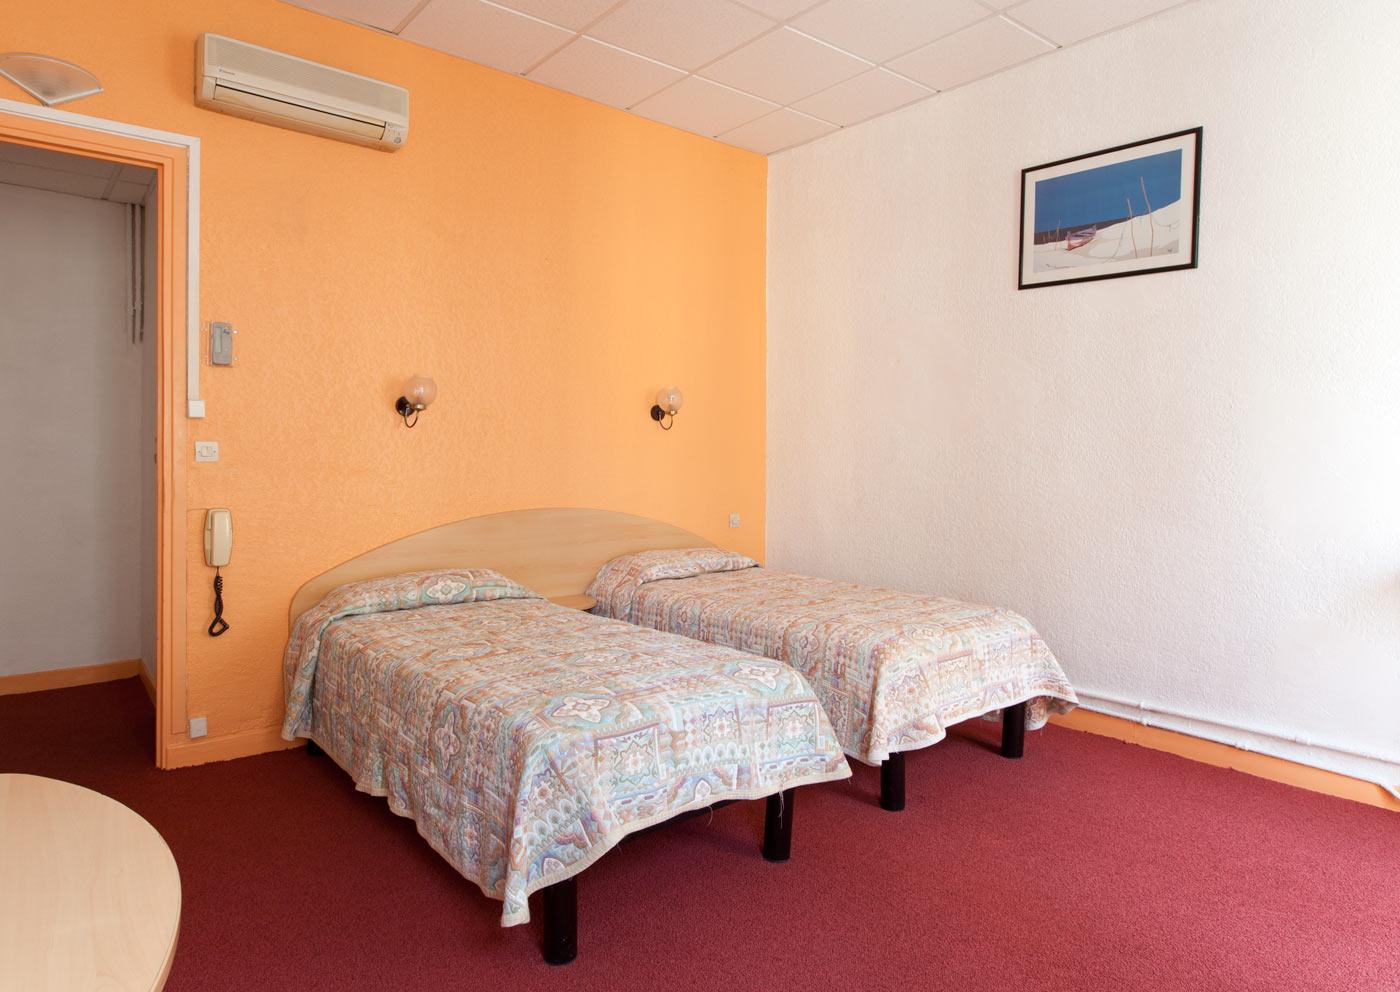 Hotel Stgothard Nice